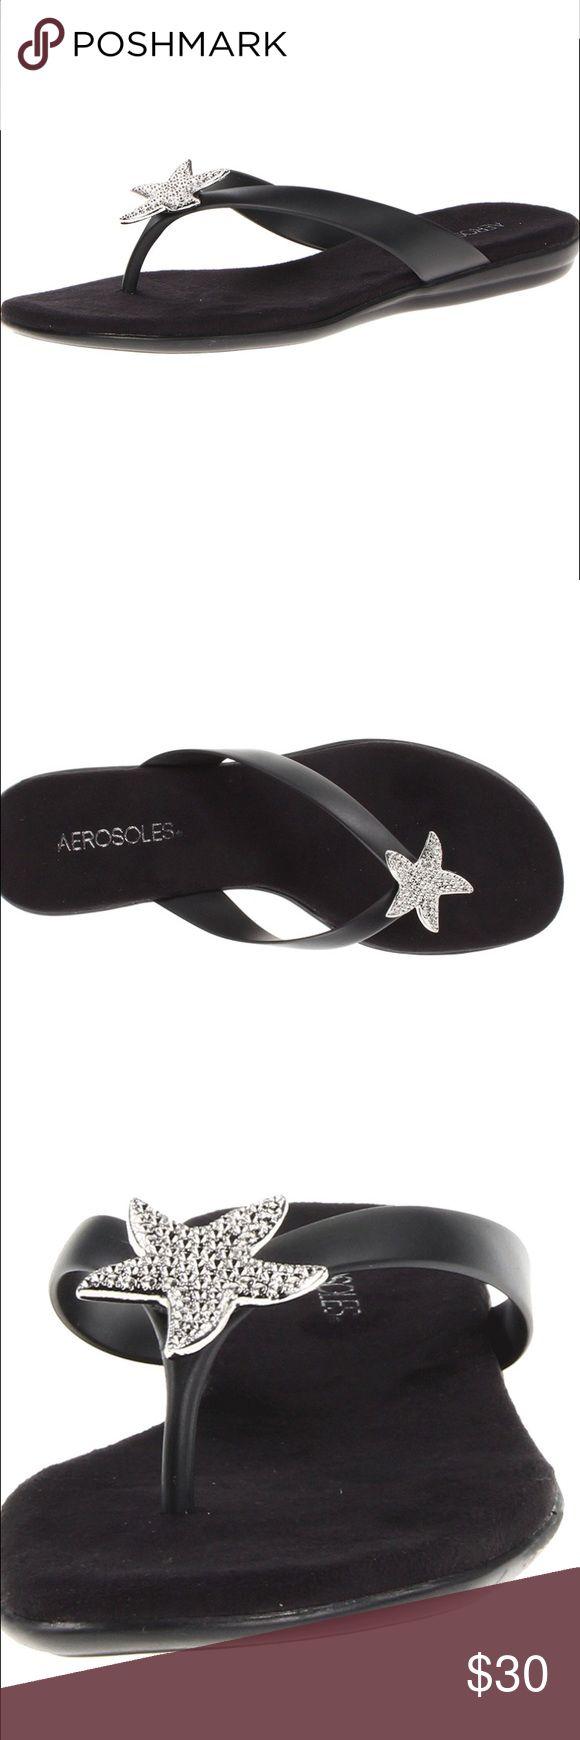 Aerosoles Beach Sandal Super cute nautical sandal. Never worn and in perfect condition ! AEROSOLES Shoes Sandals